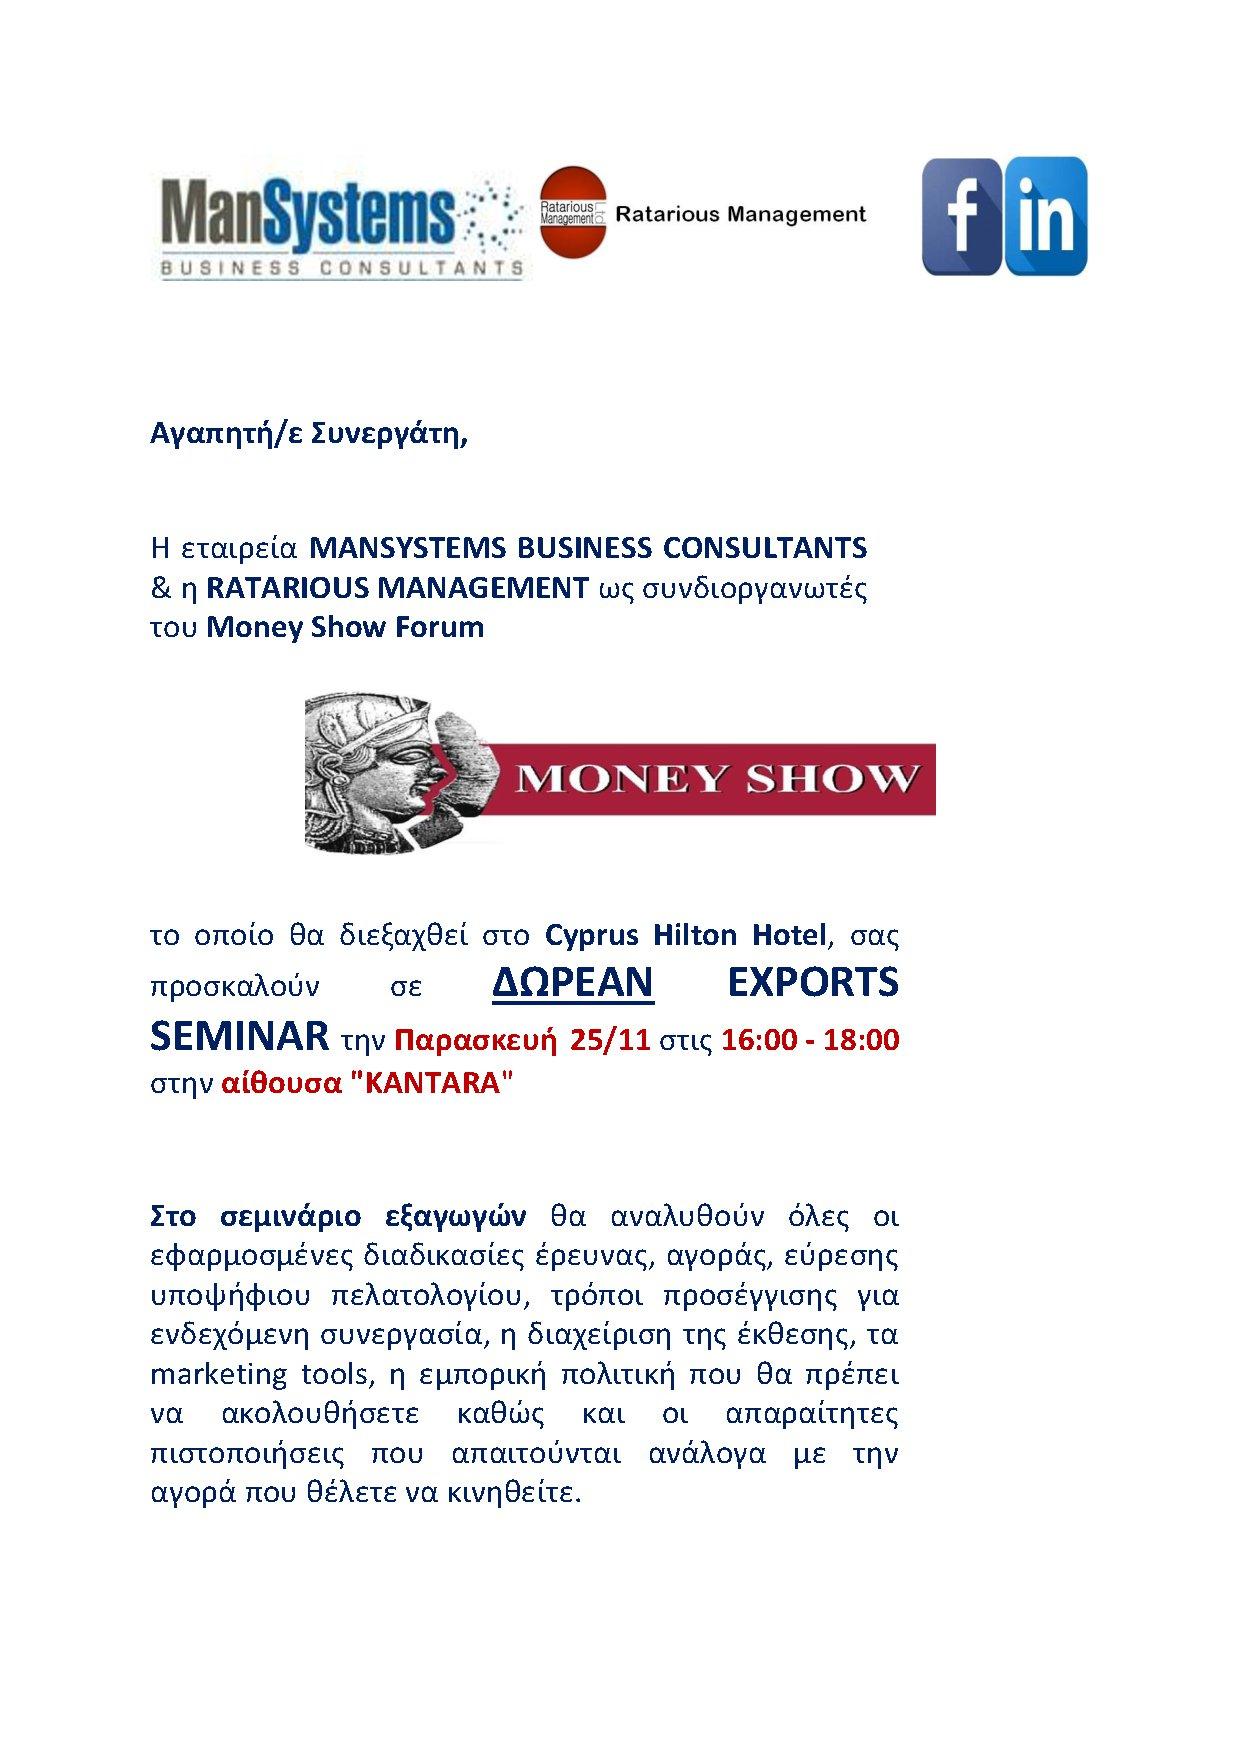 25/11/2016 Exports Seminar – Money Show